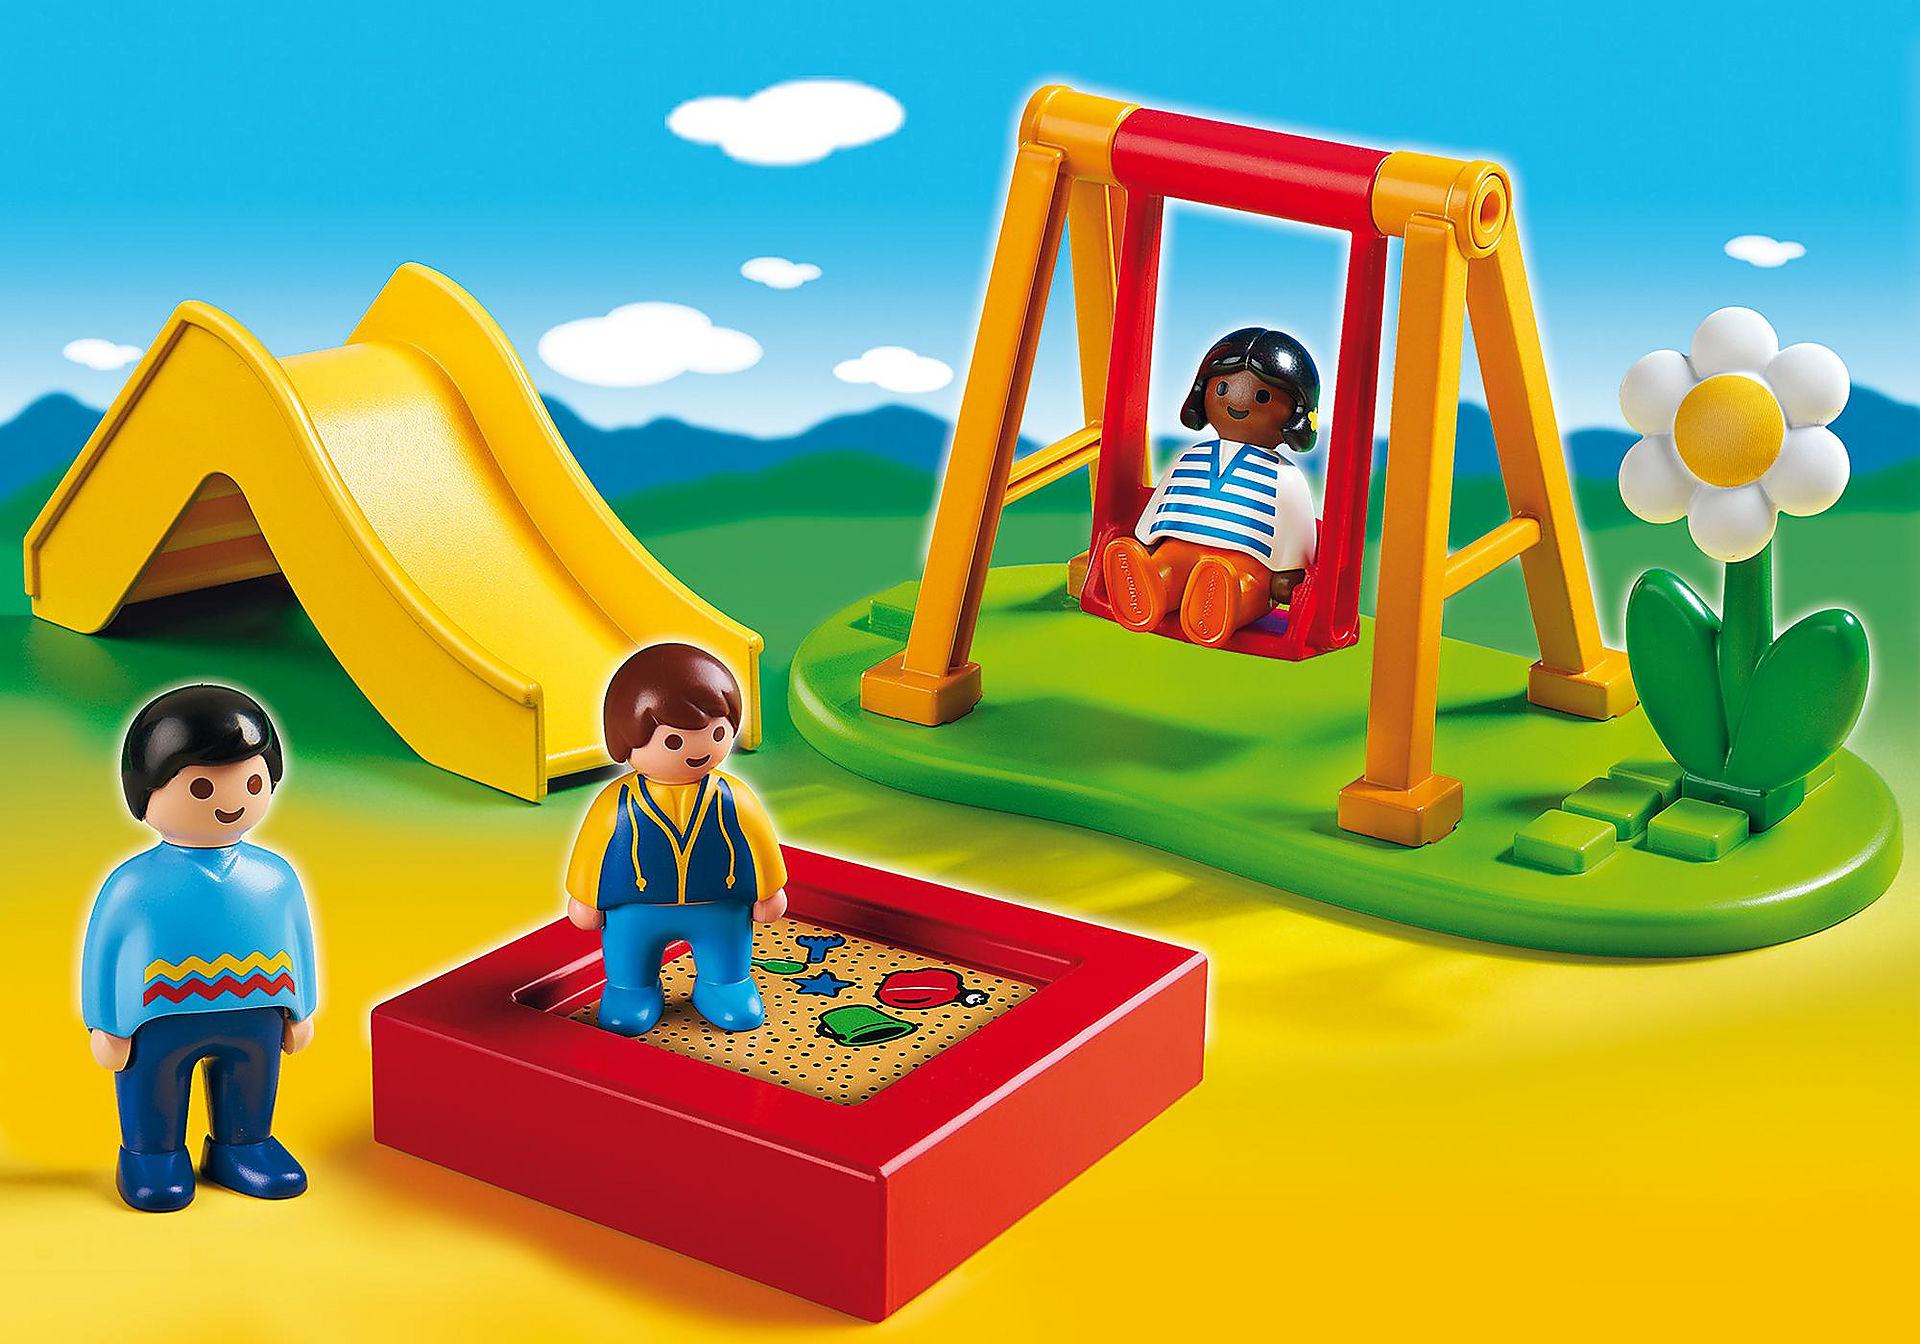 6785 Parco giochi zoom image1